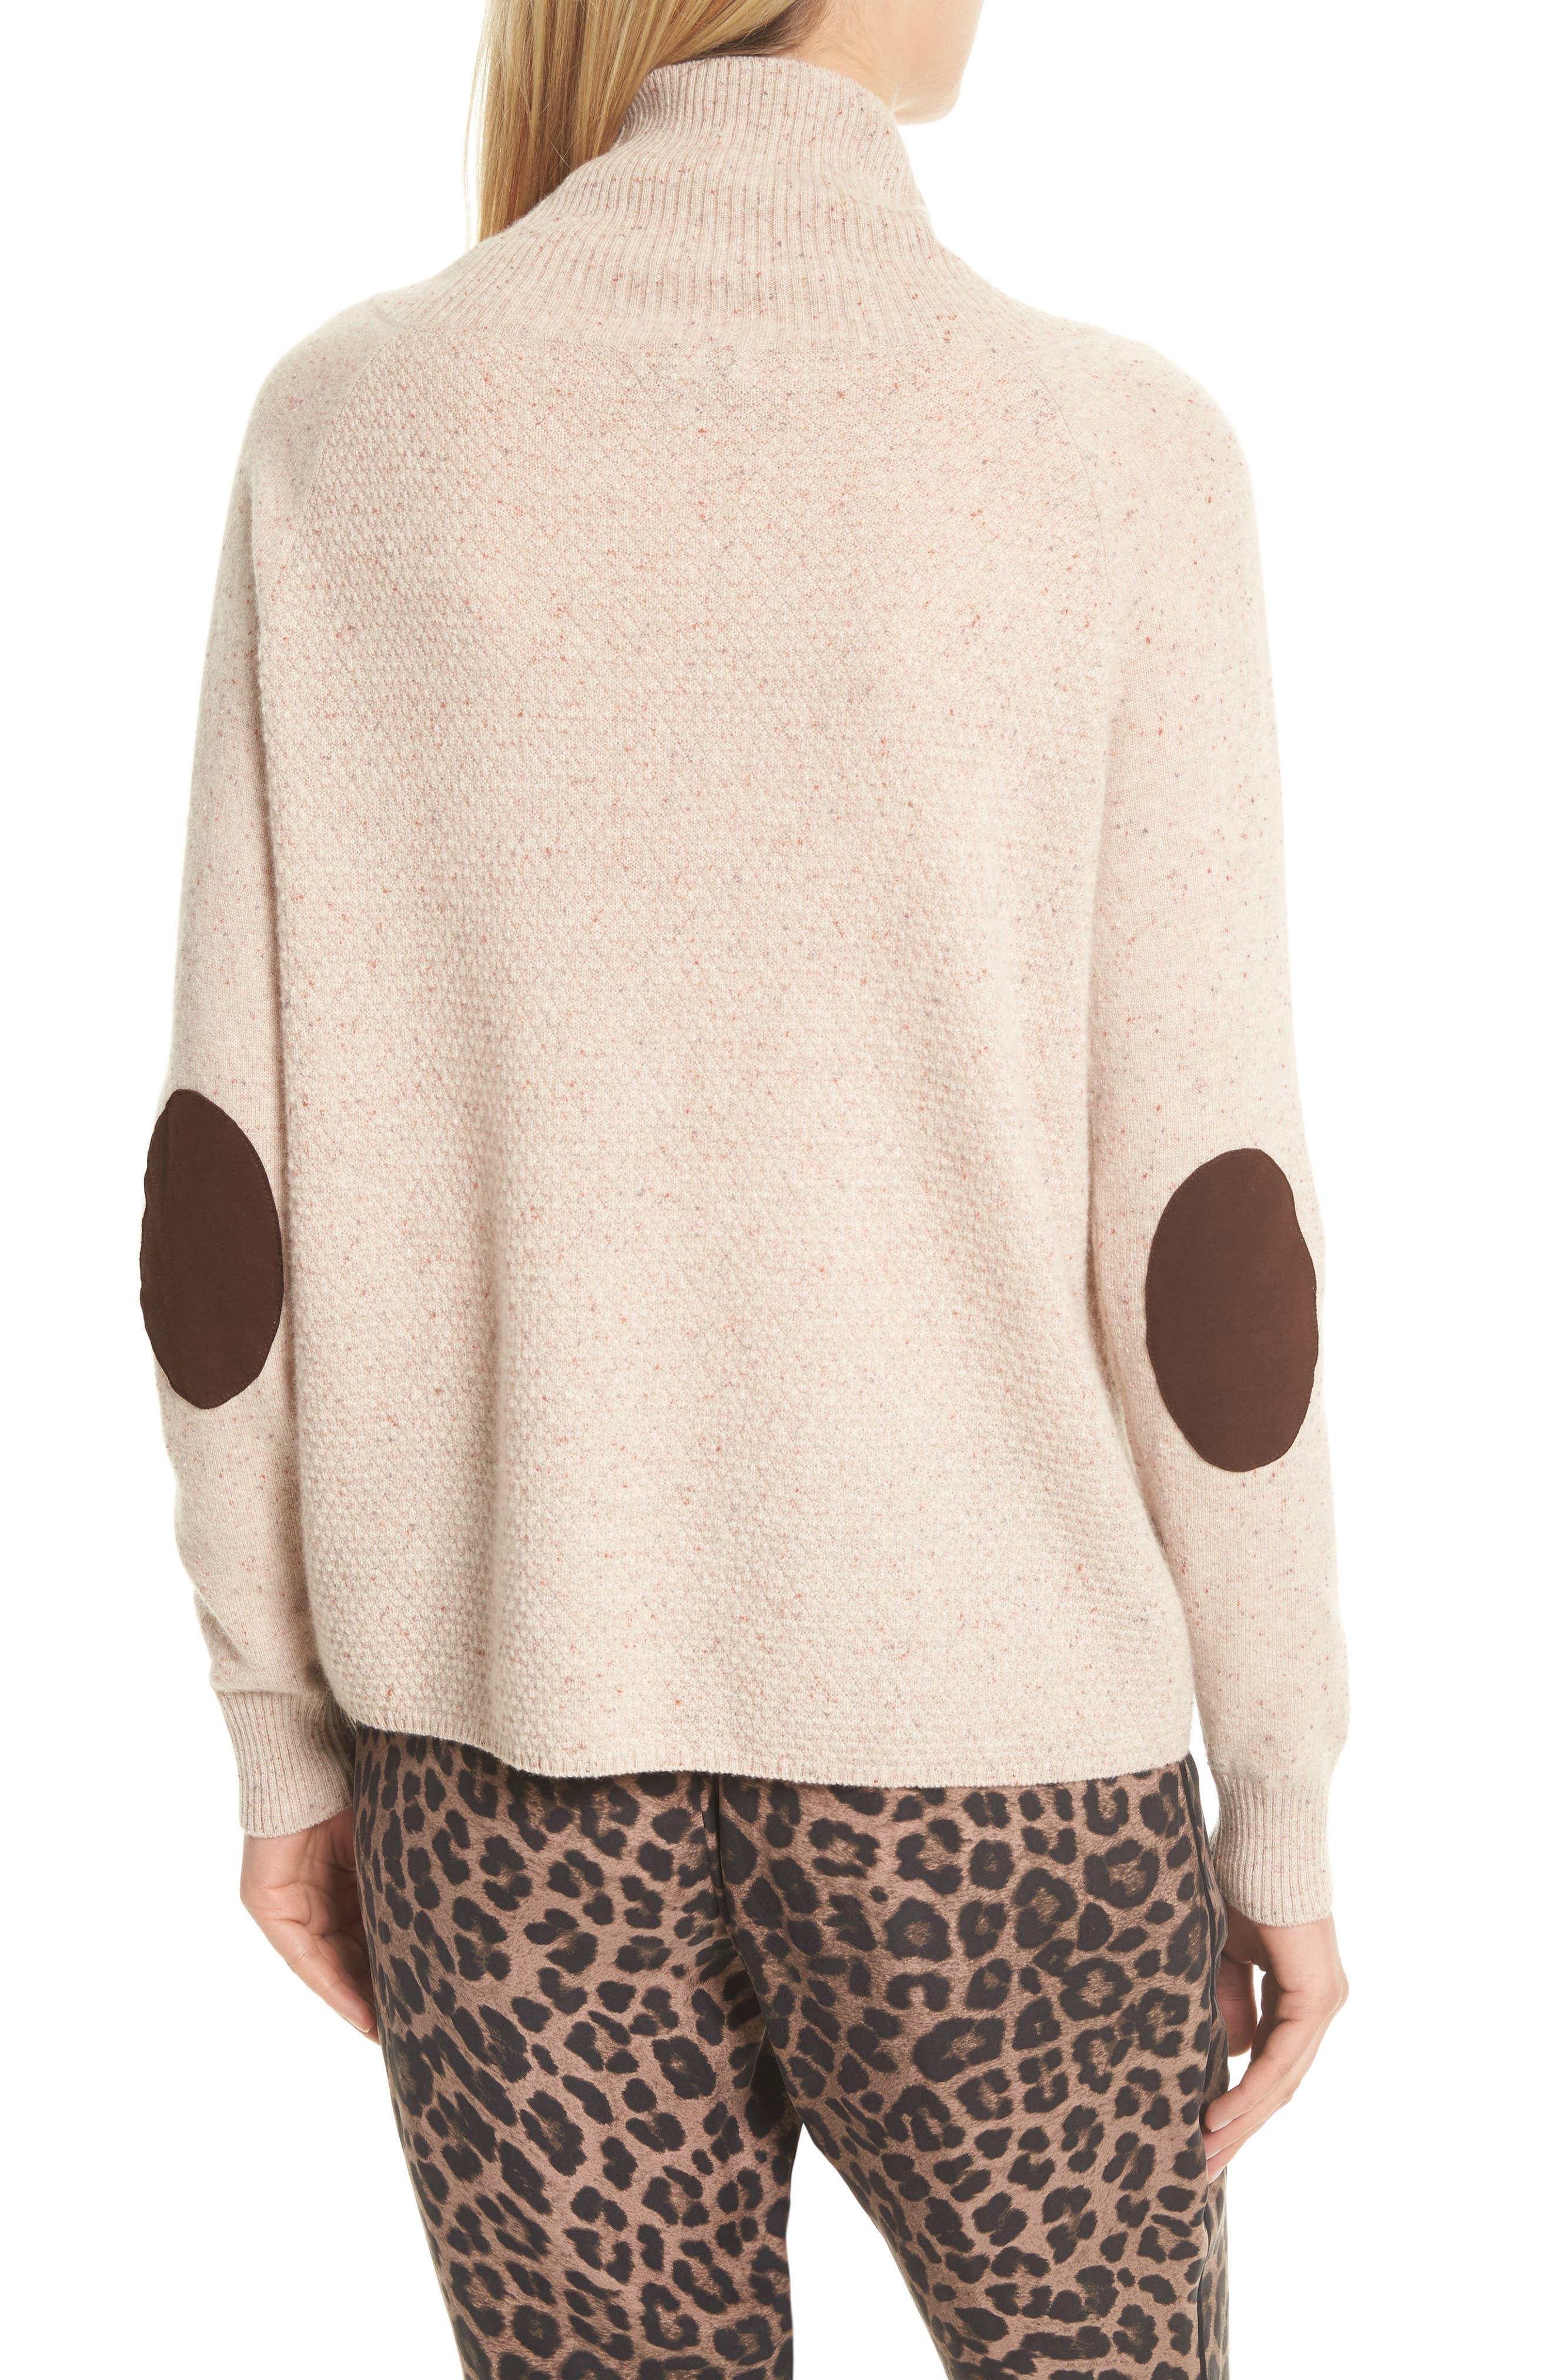 Havin Cashmere Sweater,                             Alternate thumbnail 2, color,                             696